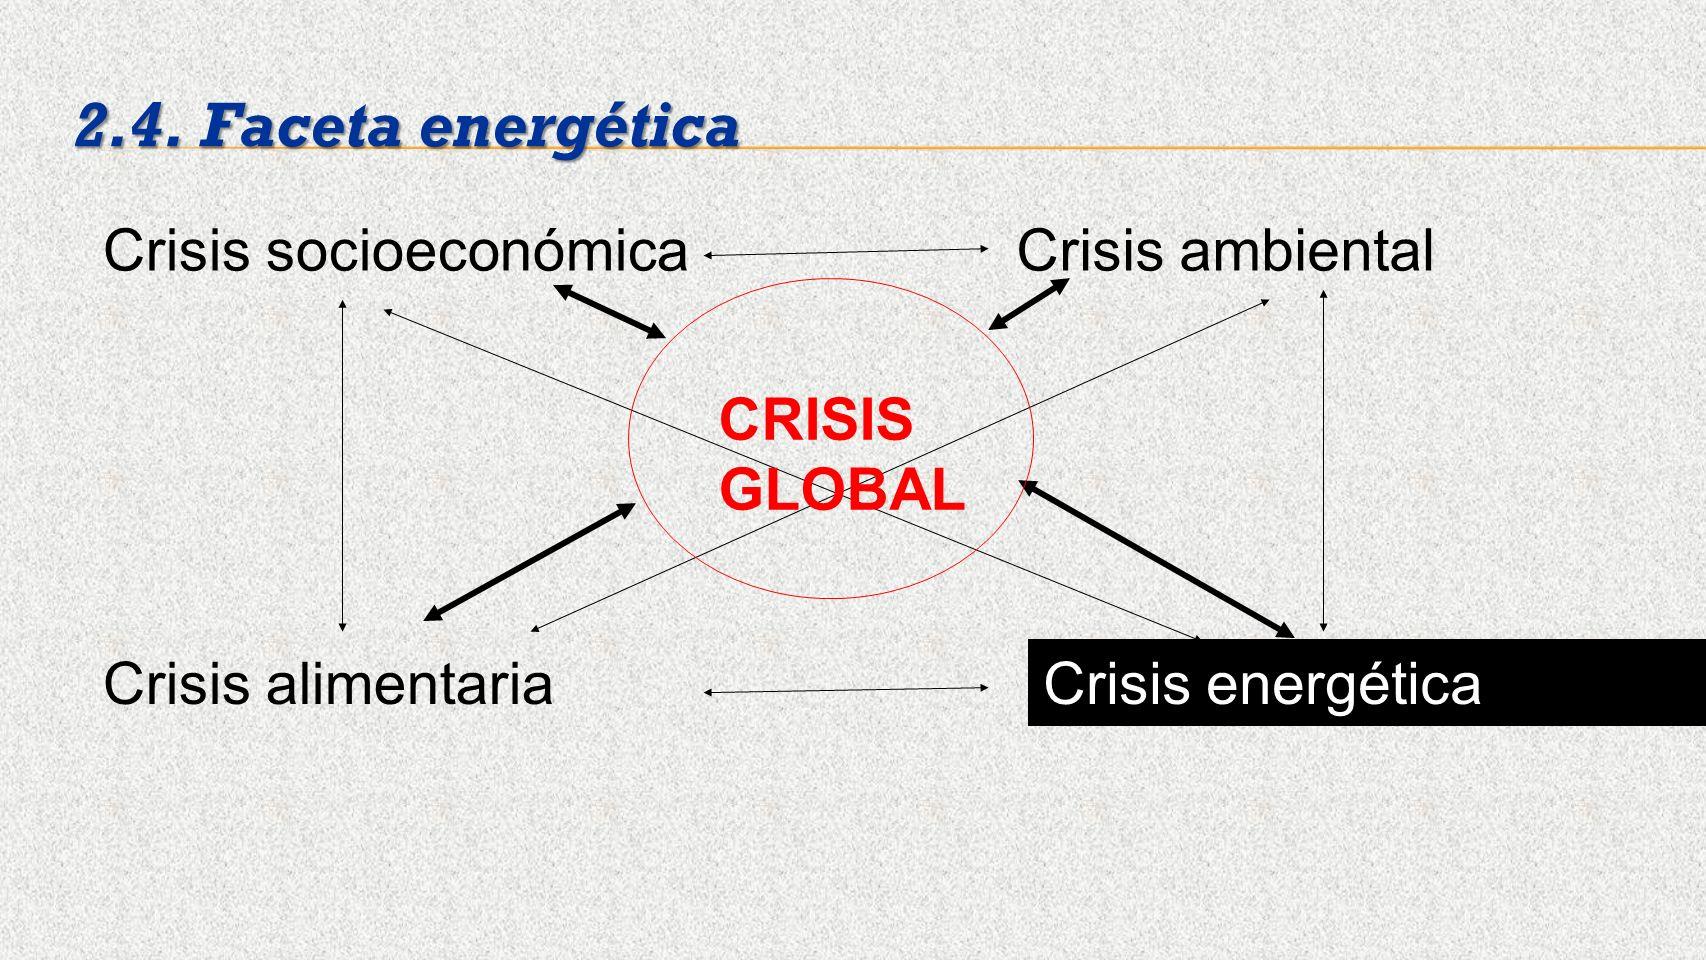 Crisis socioeconómicaCrisis ambiental Crisis alimentariaCrisis energética 2.4. Faceta energética CRISIS GLOBAL